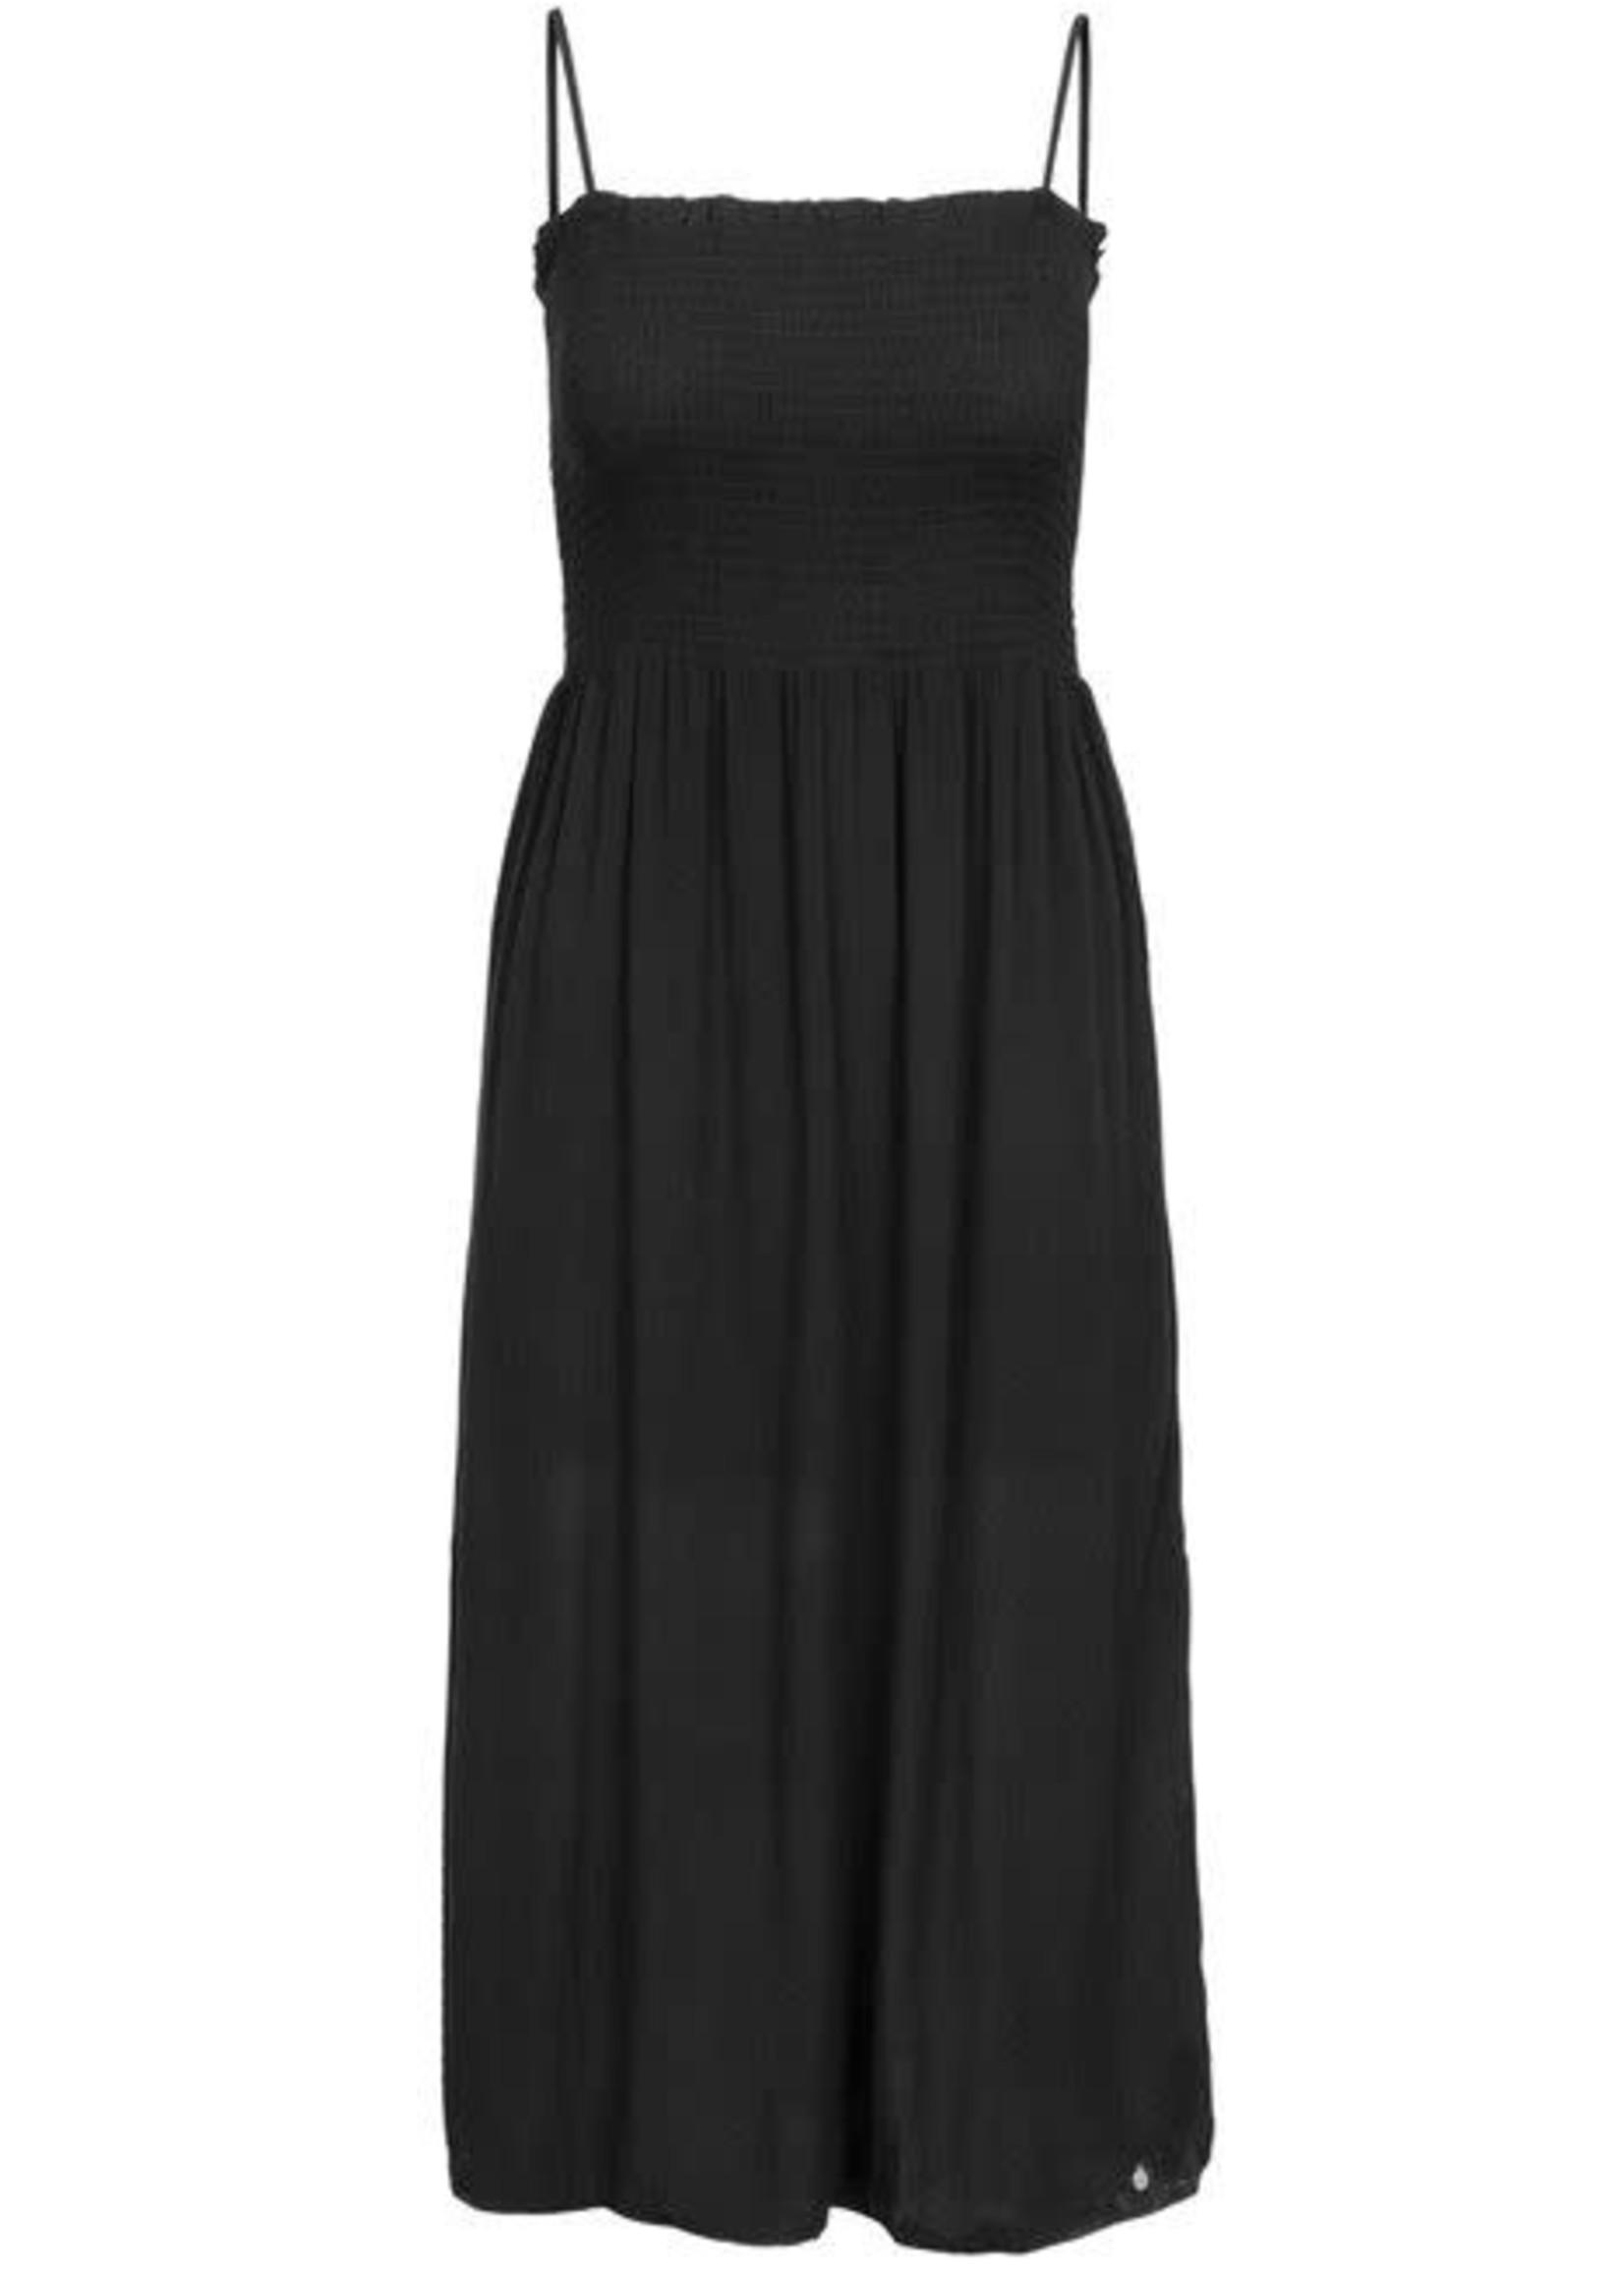 ZUSSS Lange gesmokte jurk zwart